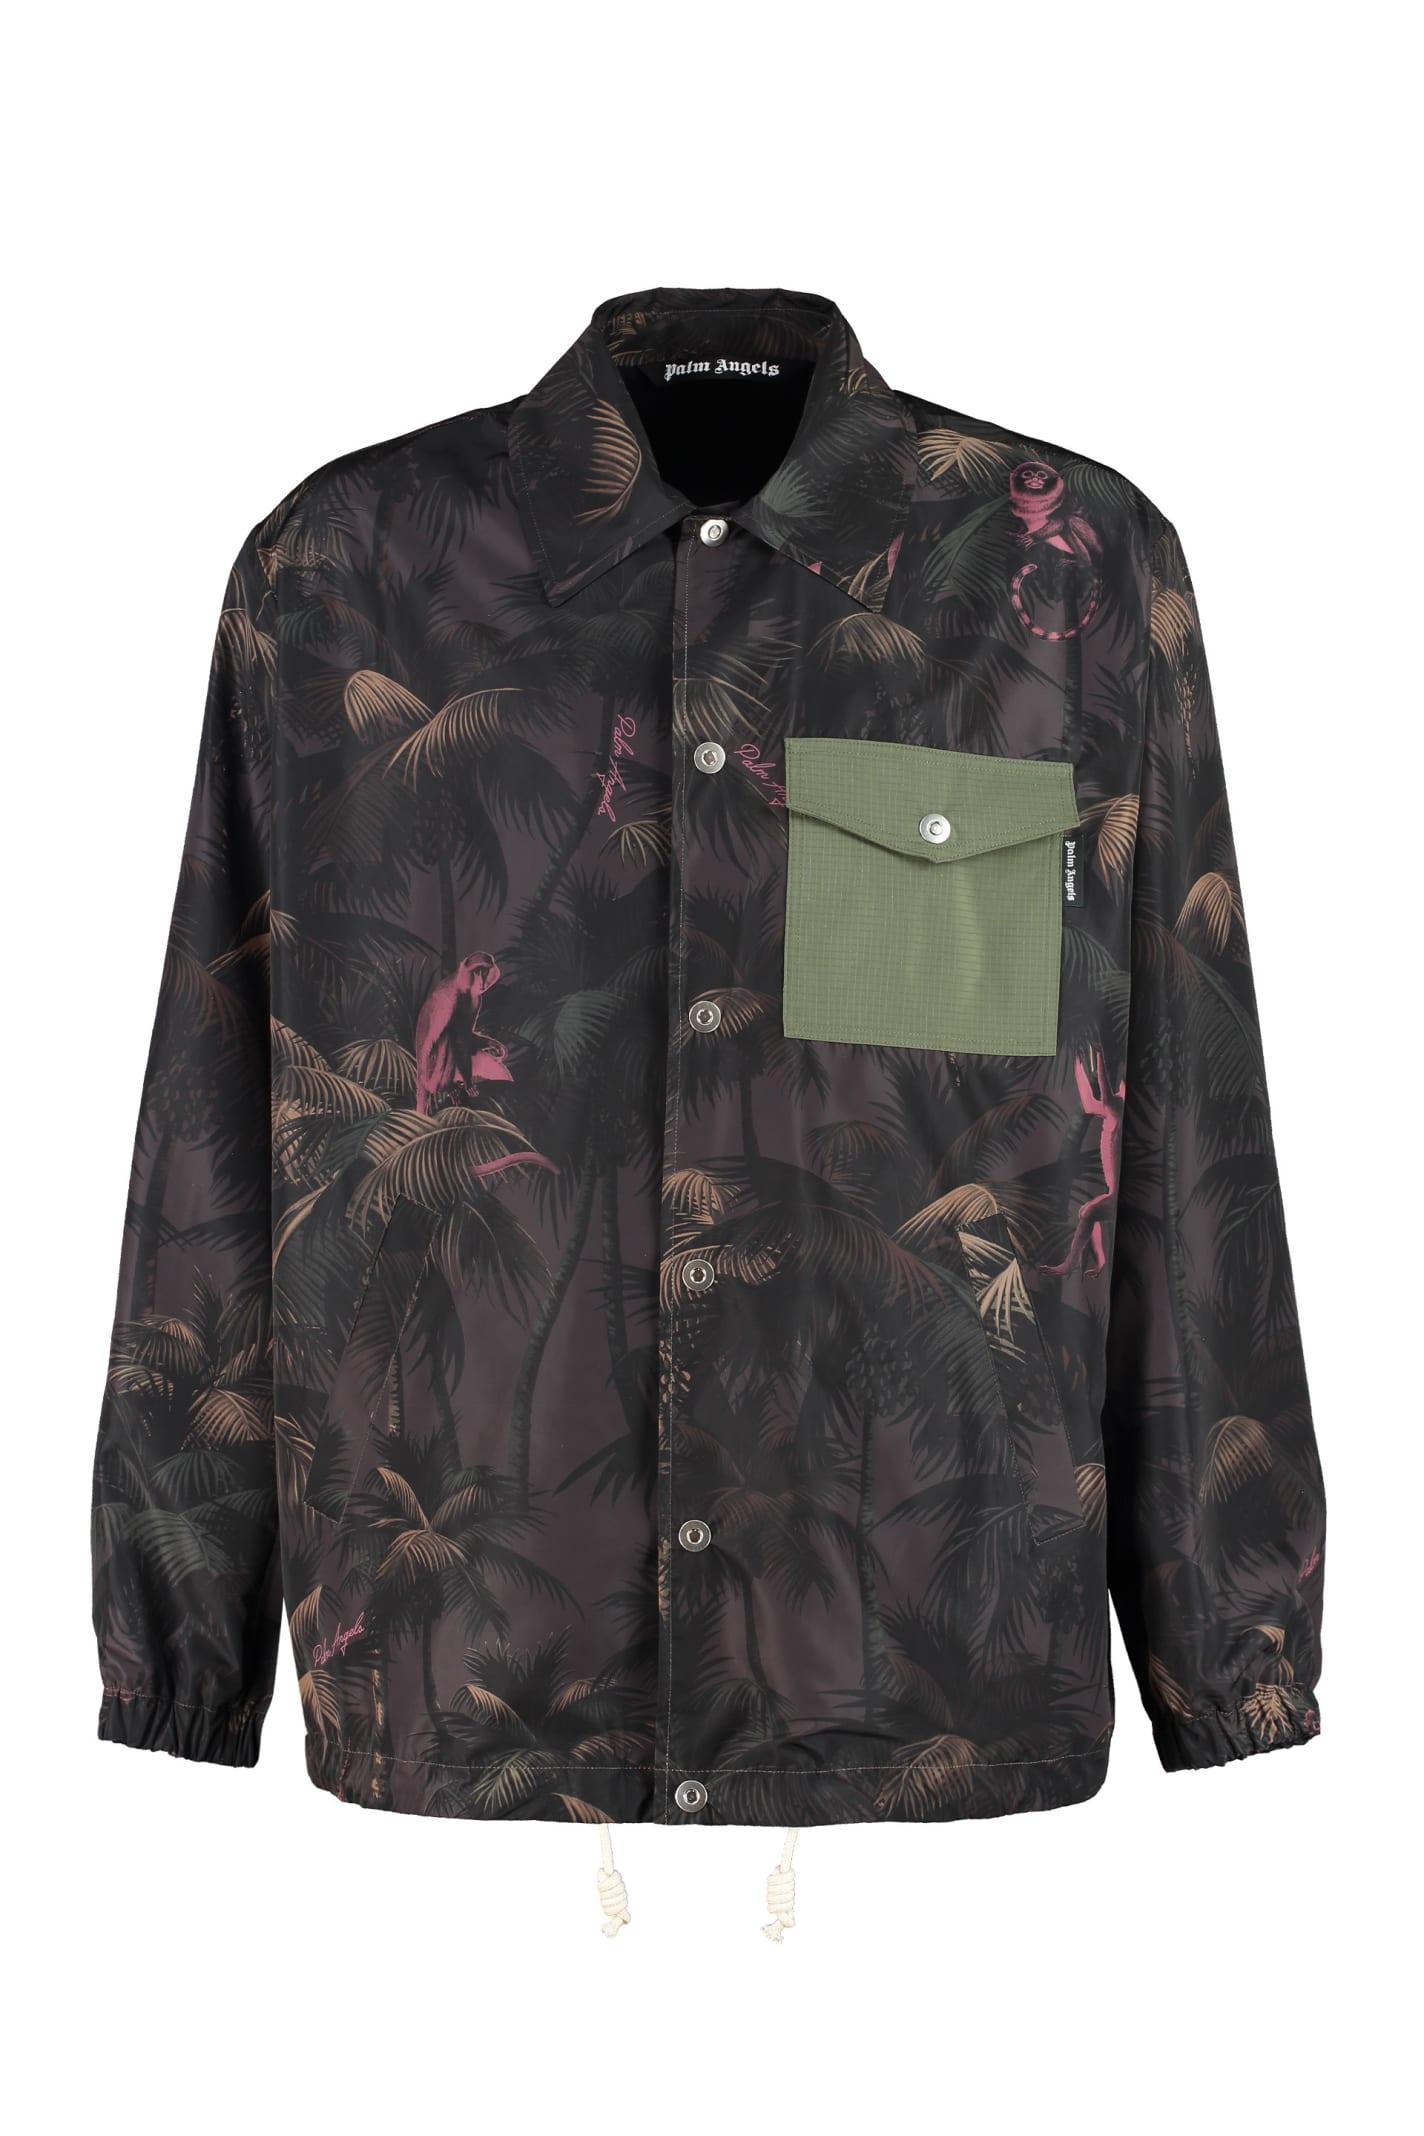 Palm Angels Techno Fabric Jacket